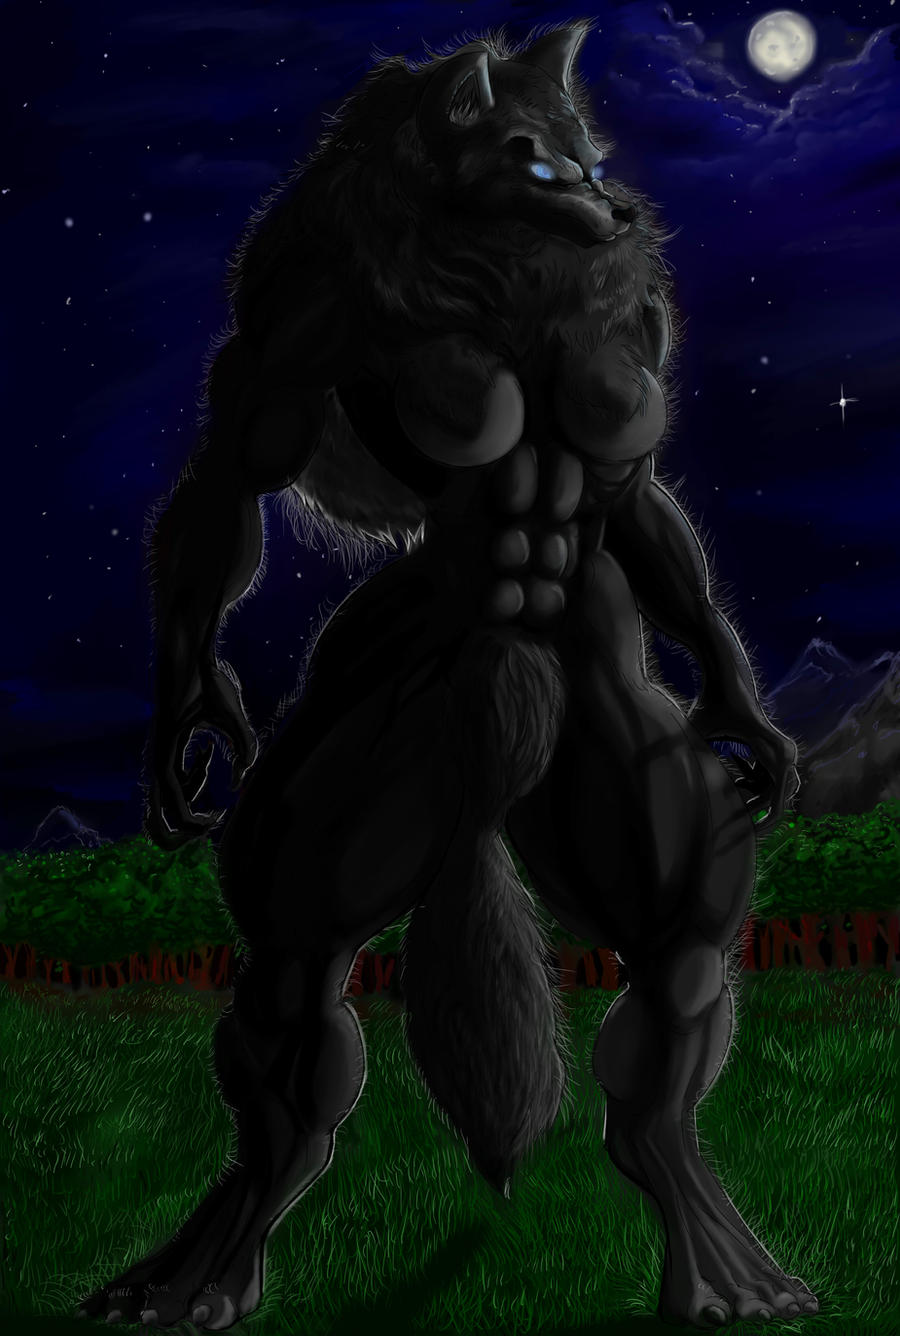 pagani zonda mod with Werewolf Woman on 22581 additionally 2668 Audi Rs7 X Uk besides Werewolf Woman besides Liberty Walk Bugatti Veyron Is Not Impossible 103530 also 24867 Monster Patriot.